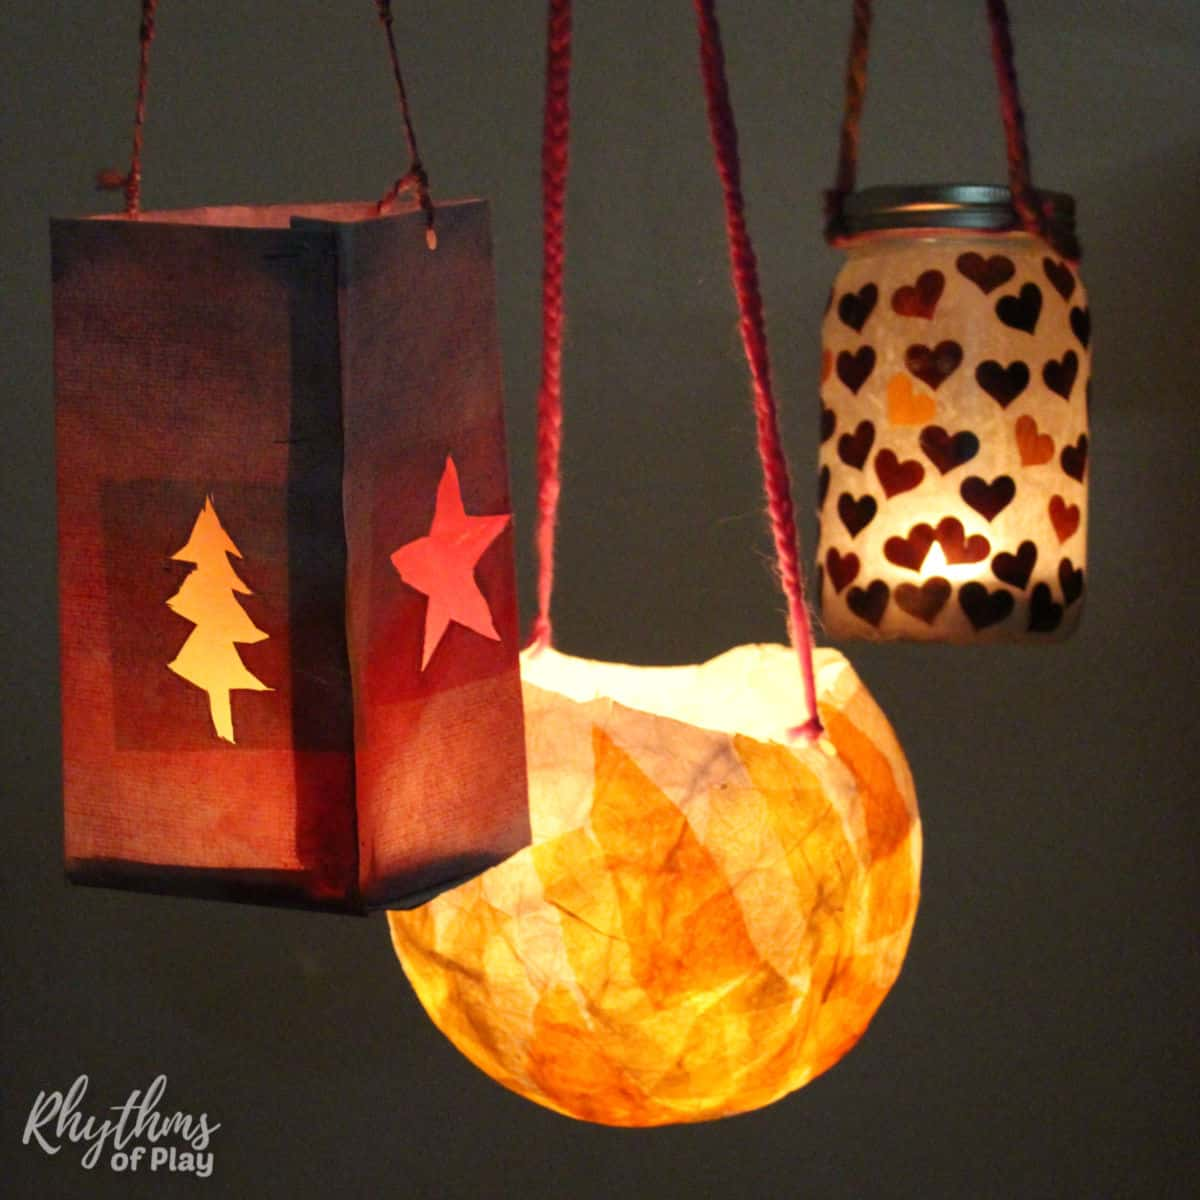 Three types of lanterns for lantern walk; paper, paper mache, and jar.